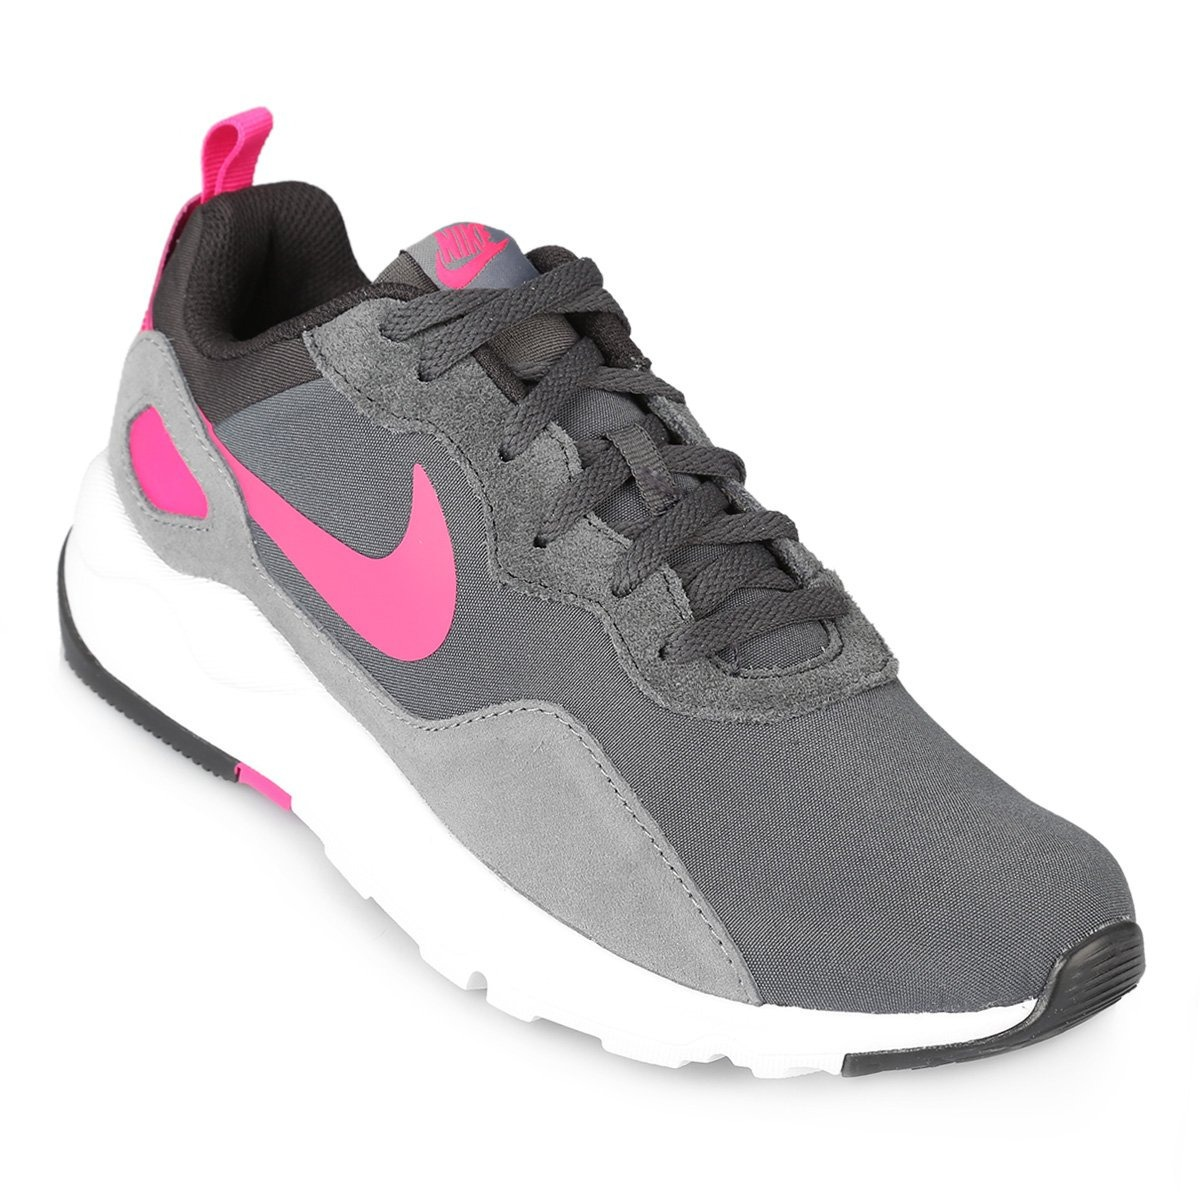 wholesale dealer 6c13c d2721 Zapatillas Nike Ld Runner - Mujer - Gris + Rosa - $ 4.007,72 en ...